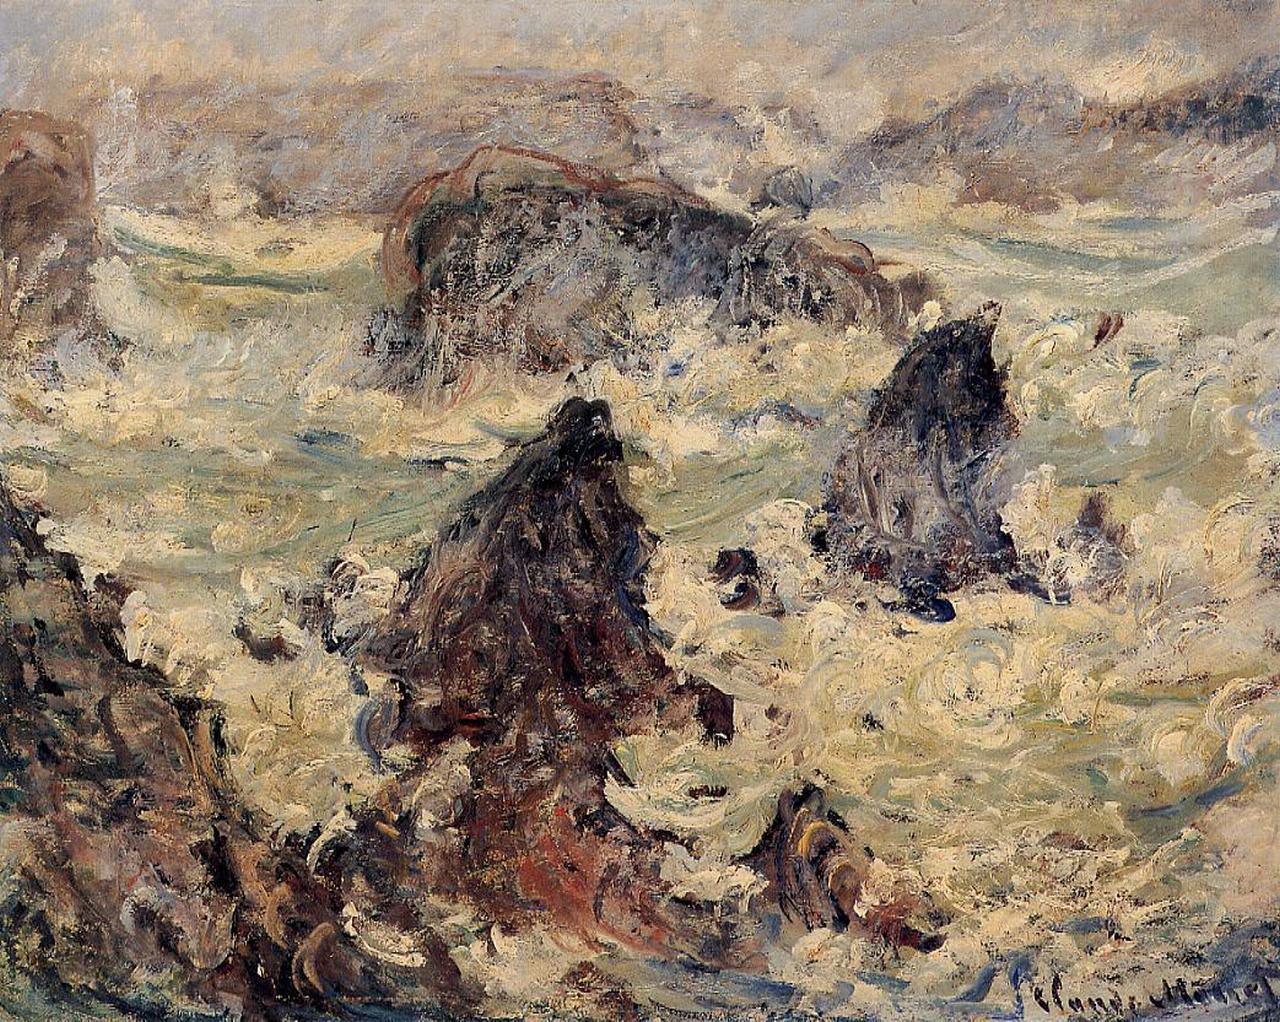 скалы и море < Шторм >:: Клод Моне, описание картины - Claude Monet фото